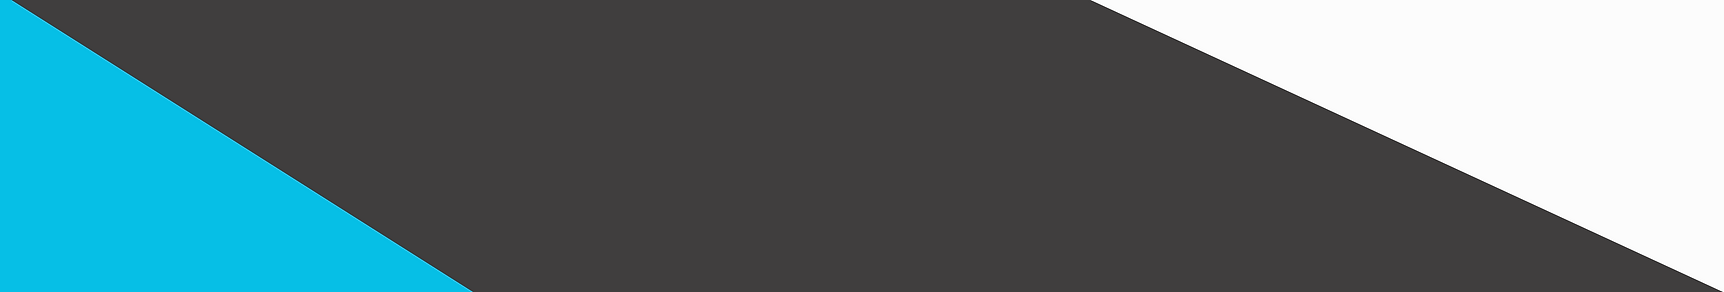 FTM blank banner-01.png